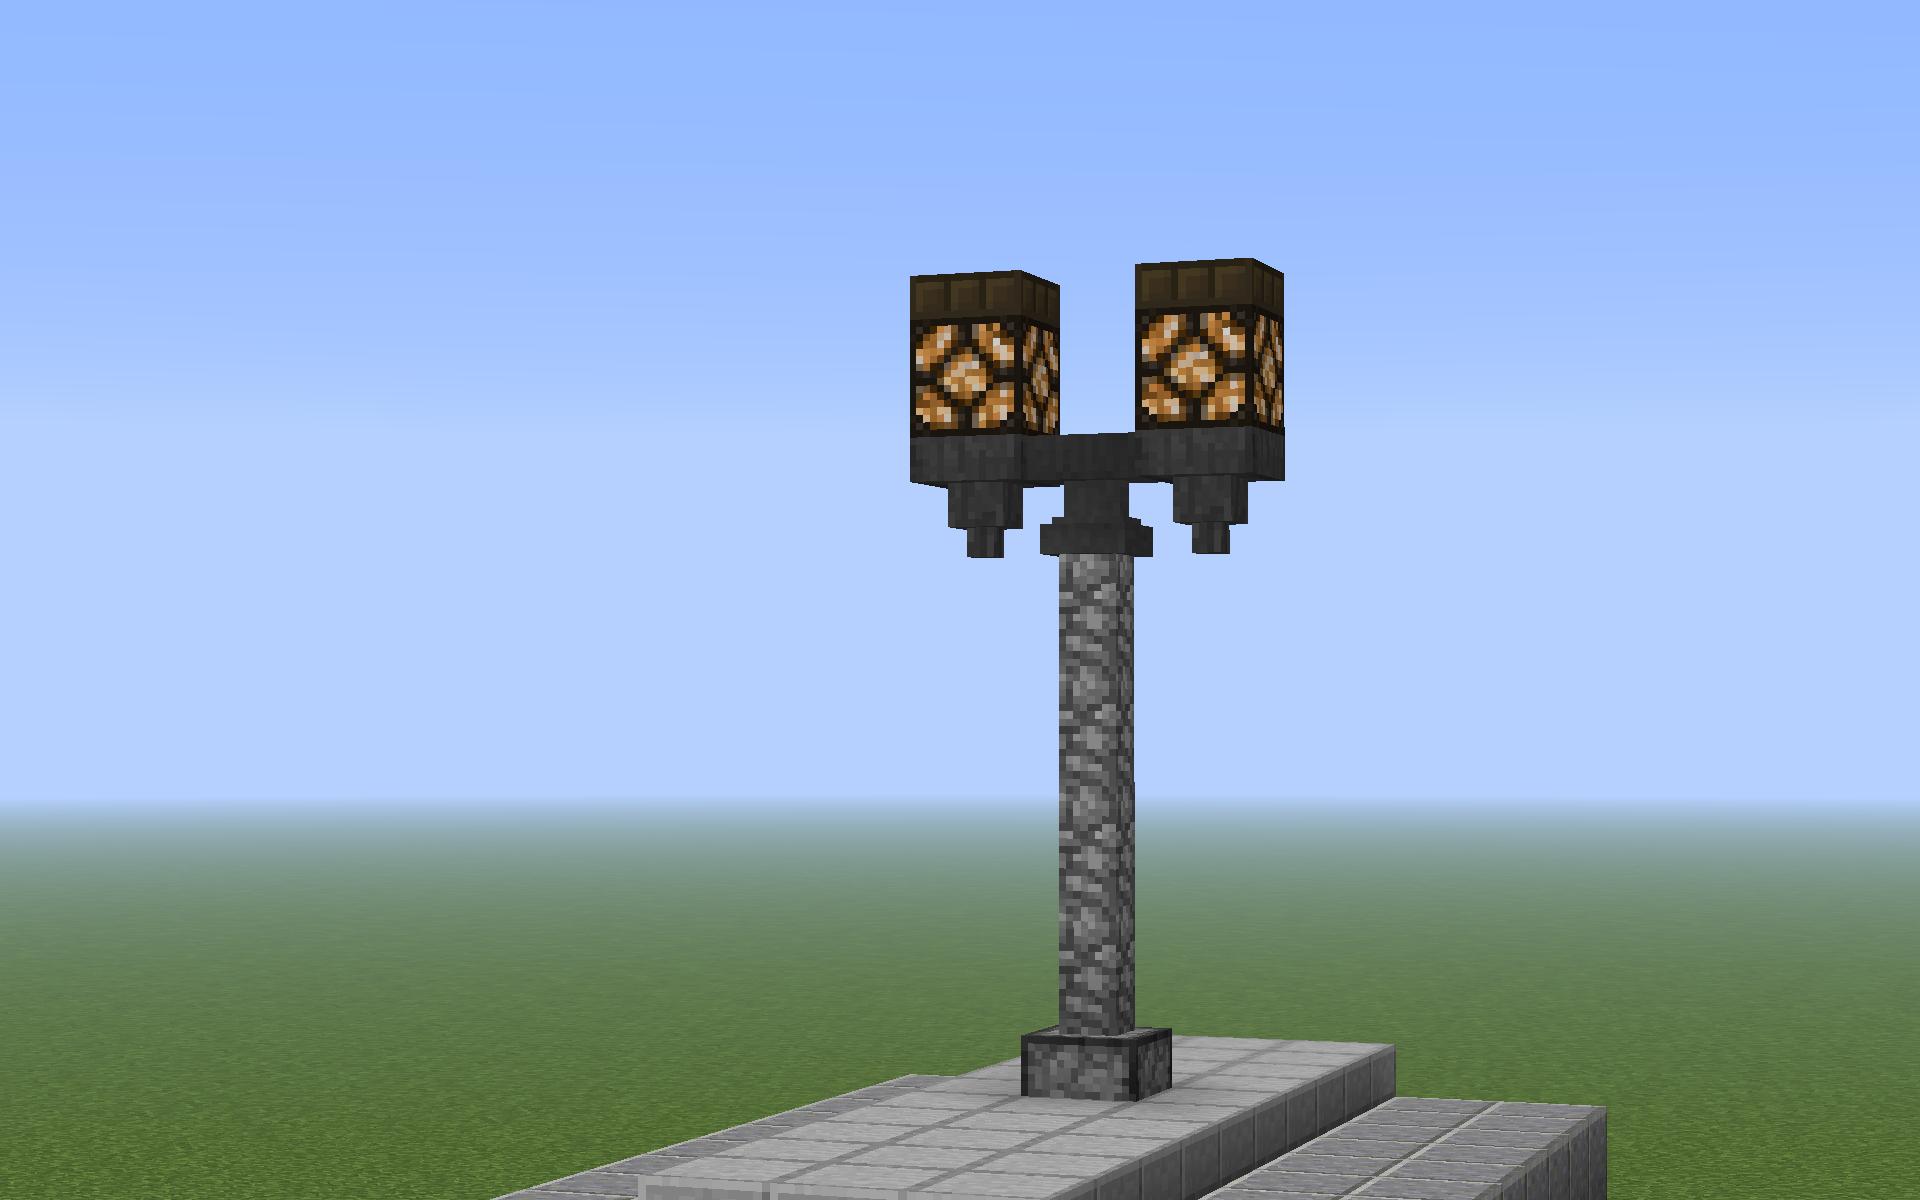 Old Style Lamp Post Minecraft Streetlamp Minecraft Decorations Minecraft Minecraft City